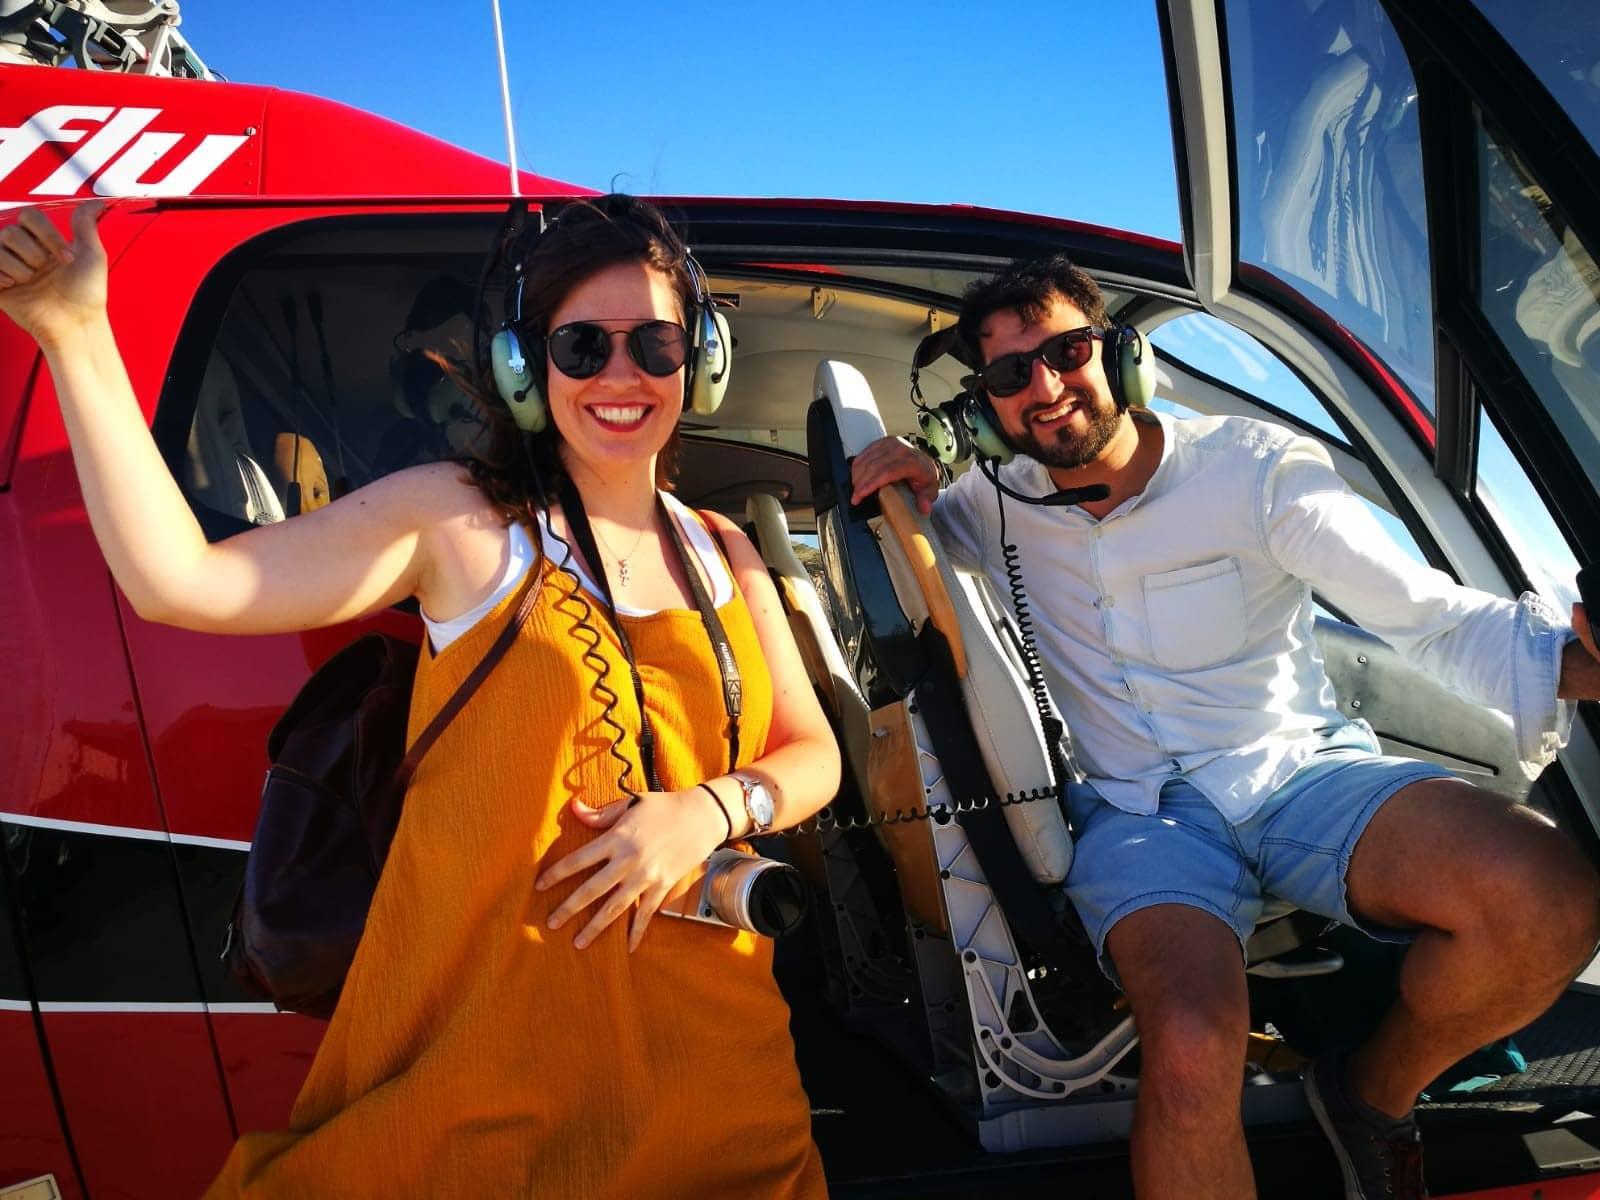 23-jun-2019-blogueros-espaoles-de-viajes-visitan-el-pen_48114462426_o